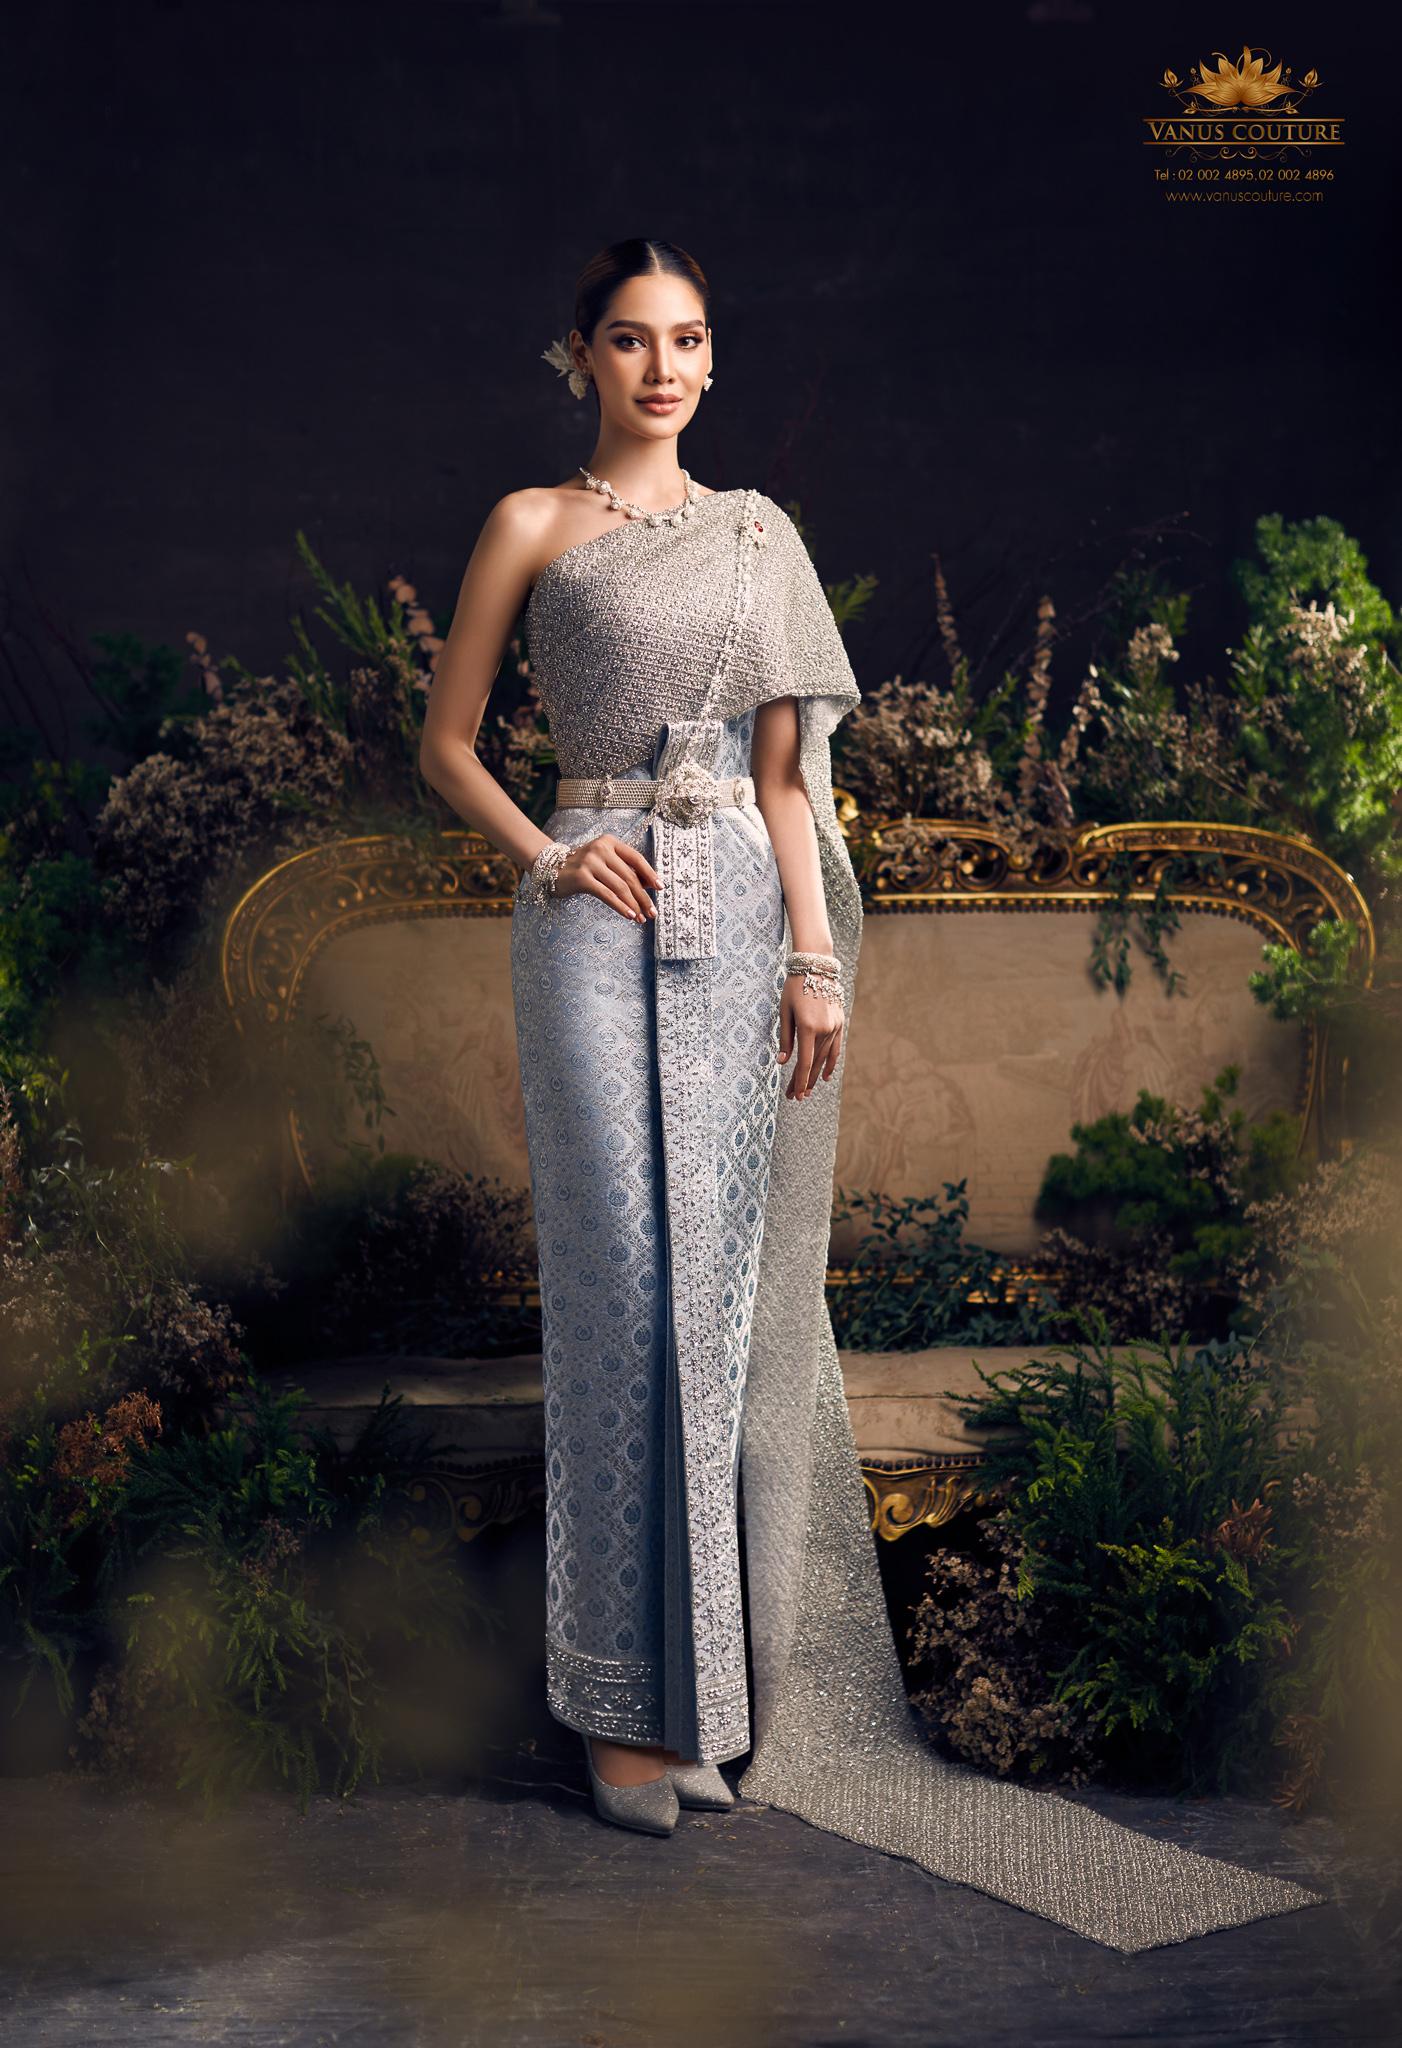 Thai traditional dress - Polfah